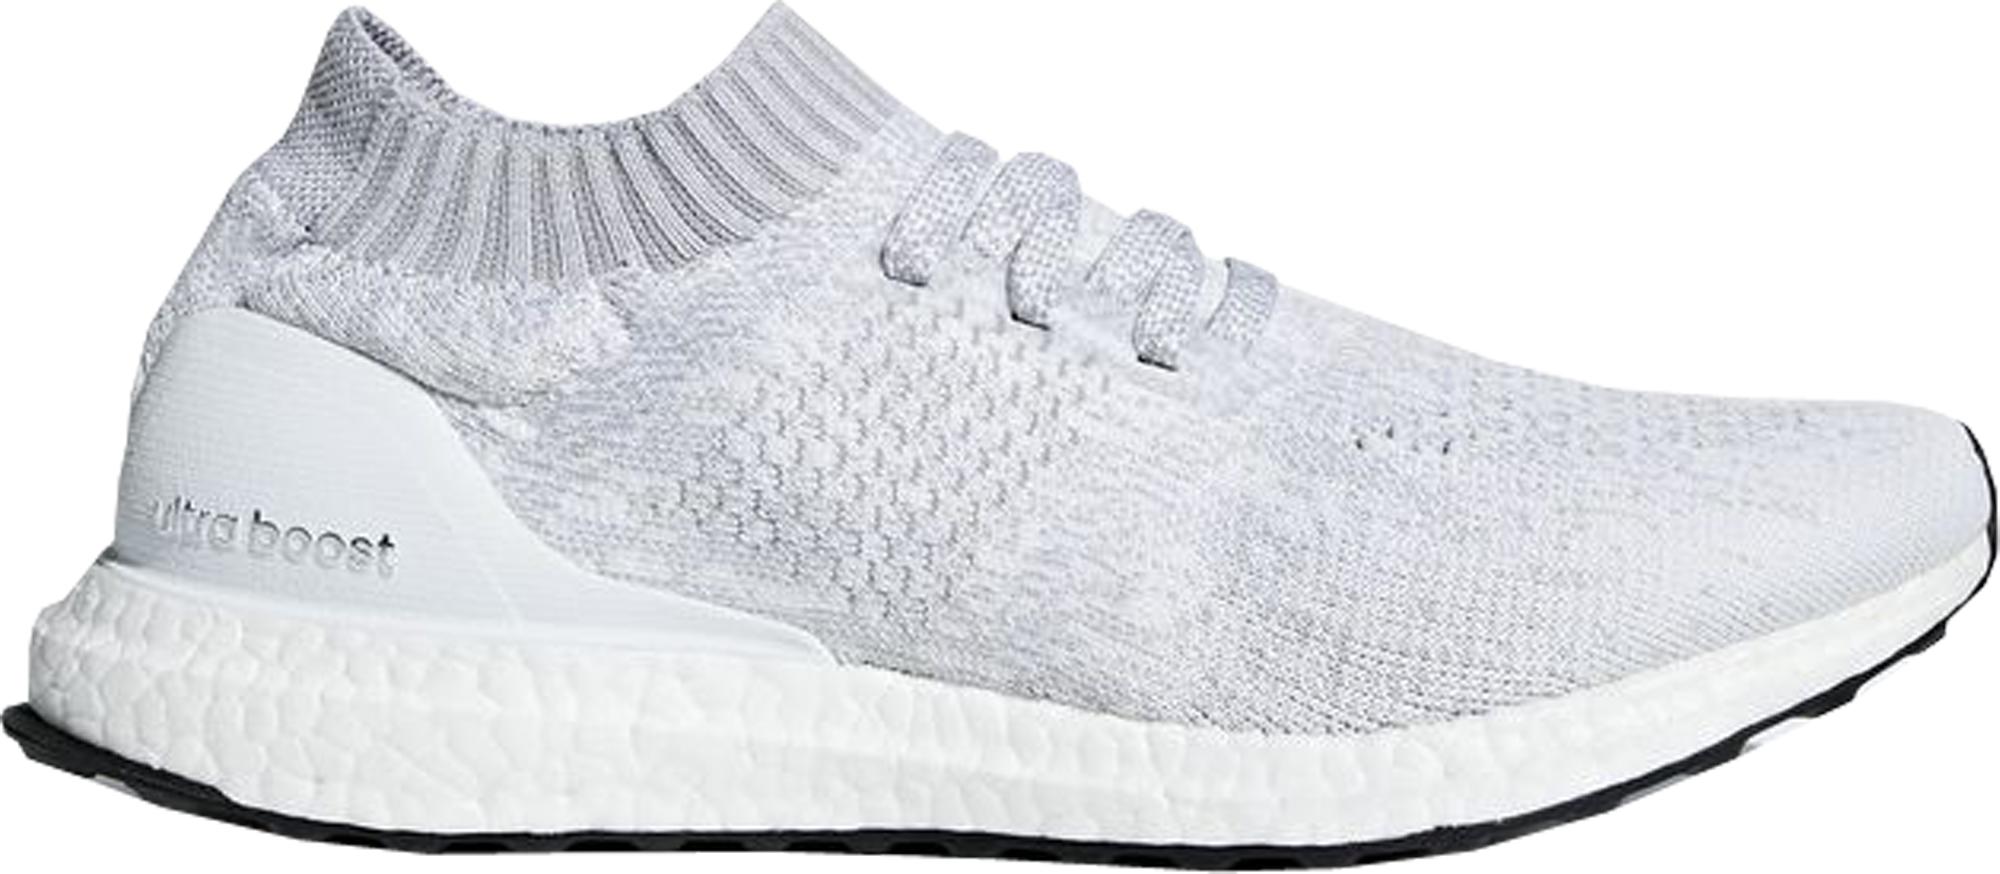 6ac0c99595fd7 ... denmark adidas ultra boost uncaged white tint e4e74 03173